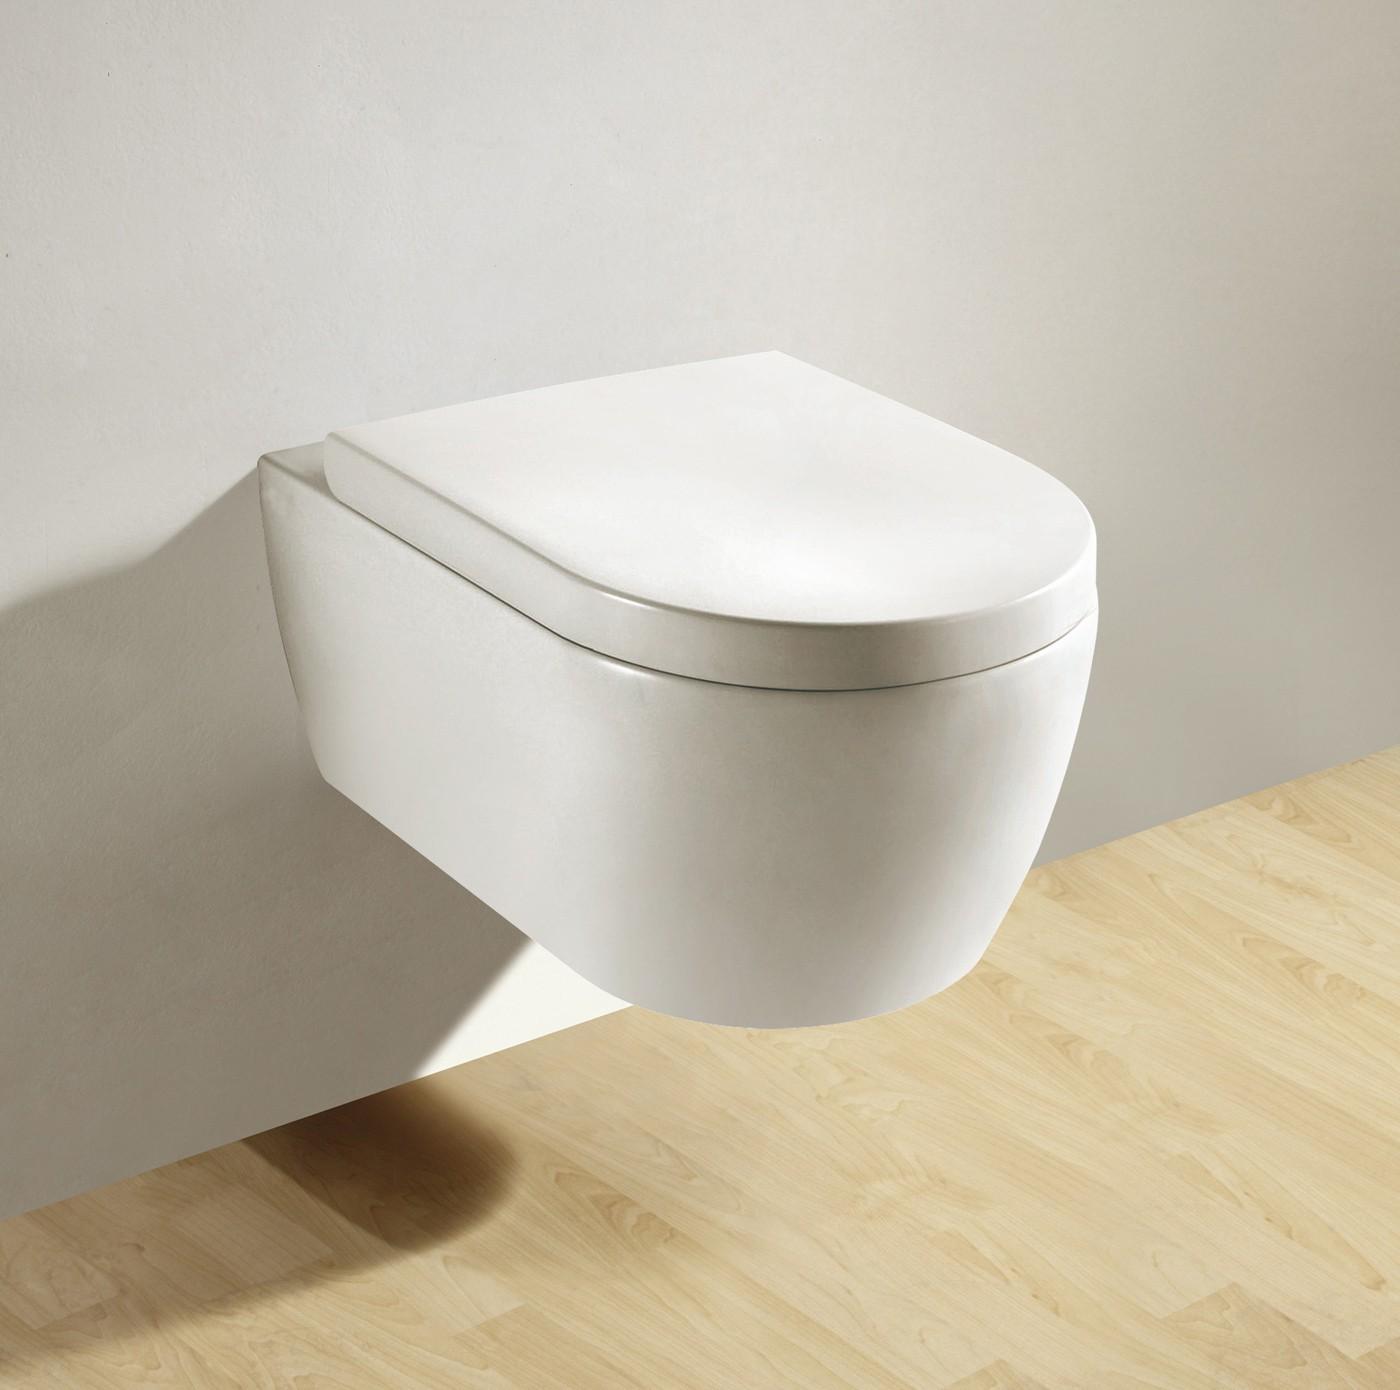 soho h nge wand wc rimless randlos toilette brillant weiss mit wc sitz badkeramik wc keramik. Black Bedroom Furniture Sets. Home Design Ideas